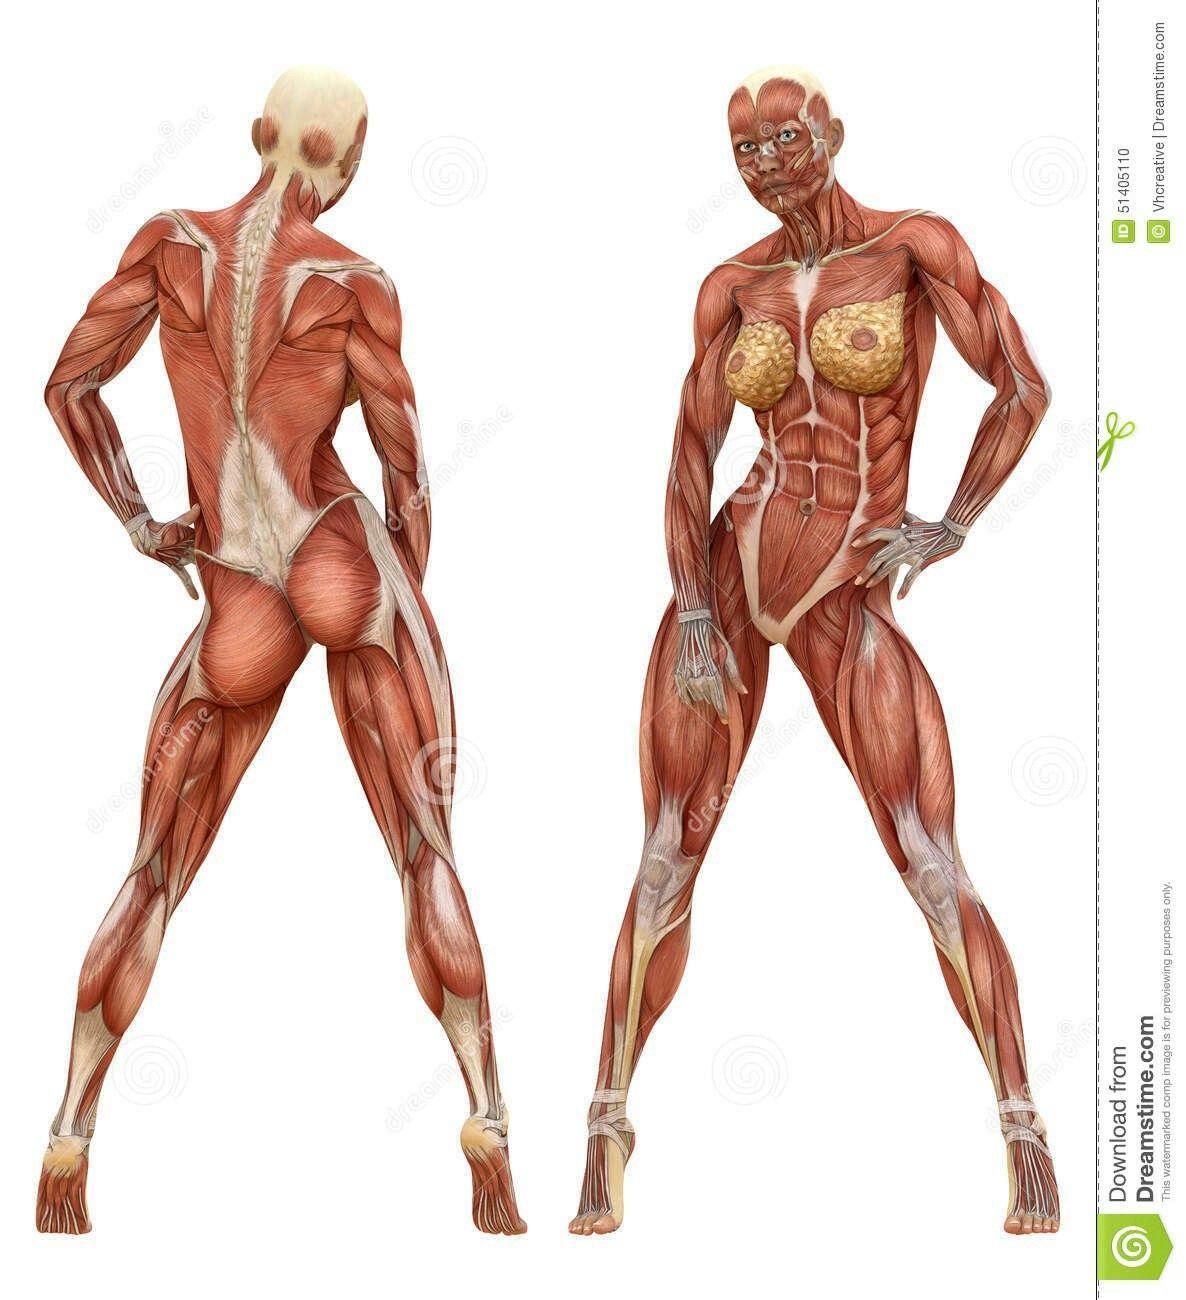 Pin by David Michel on Anatomie in 2018 | Pinterest | Anatomy ...